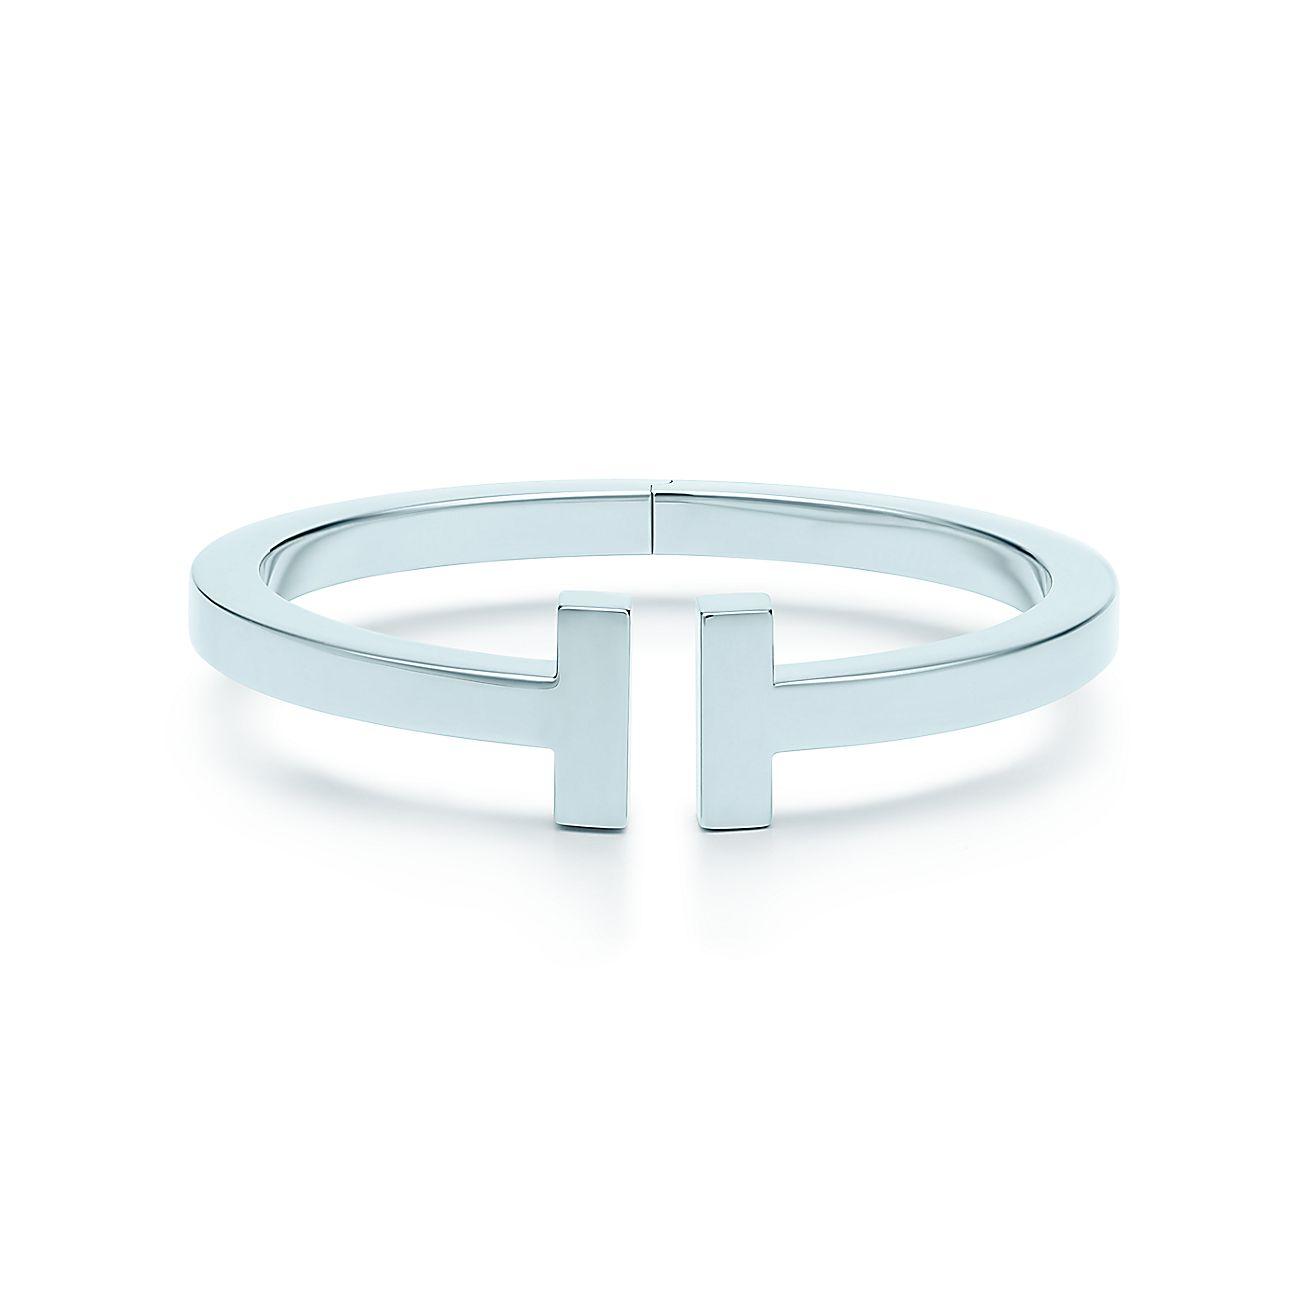 Tiffany T Square Armreif Aus Sterlingsilber Medium